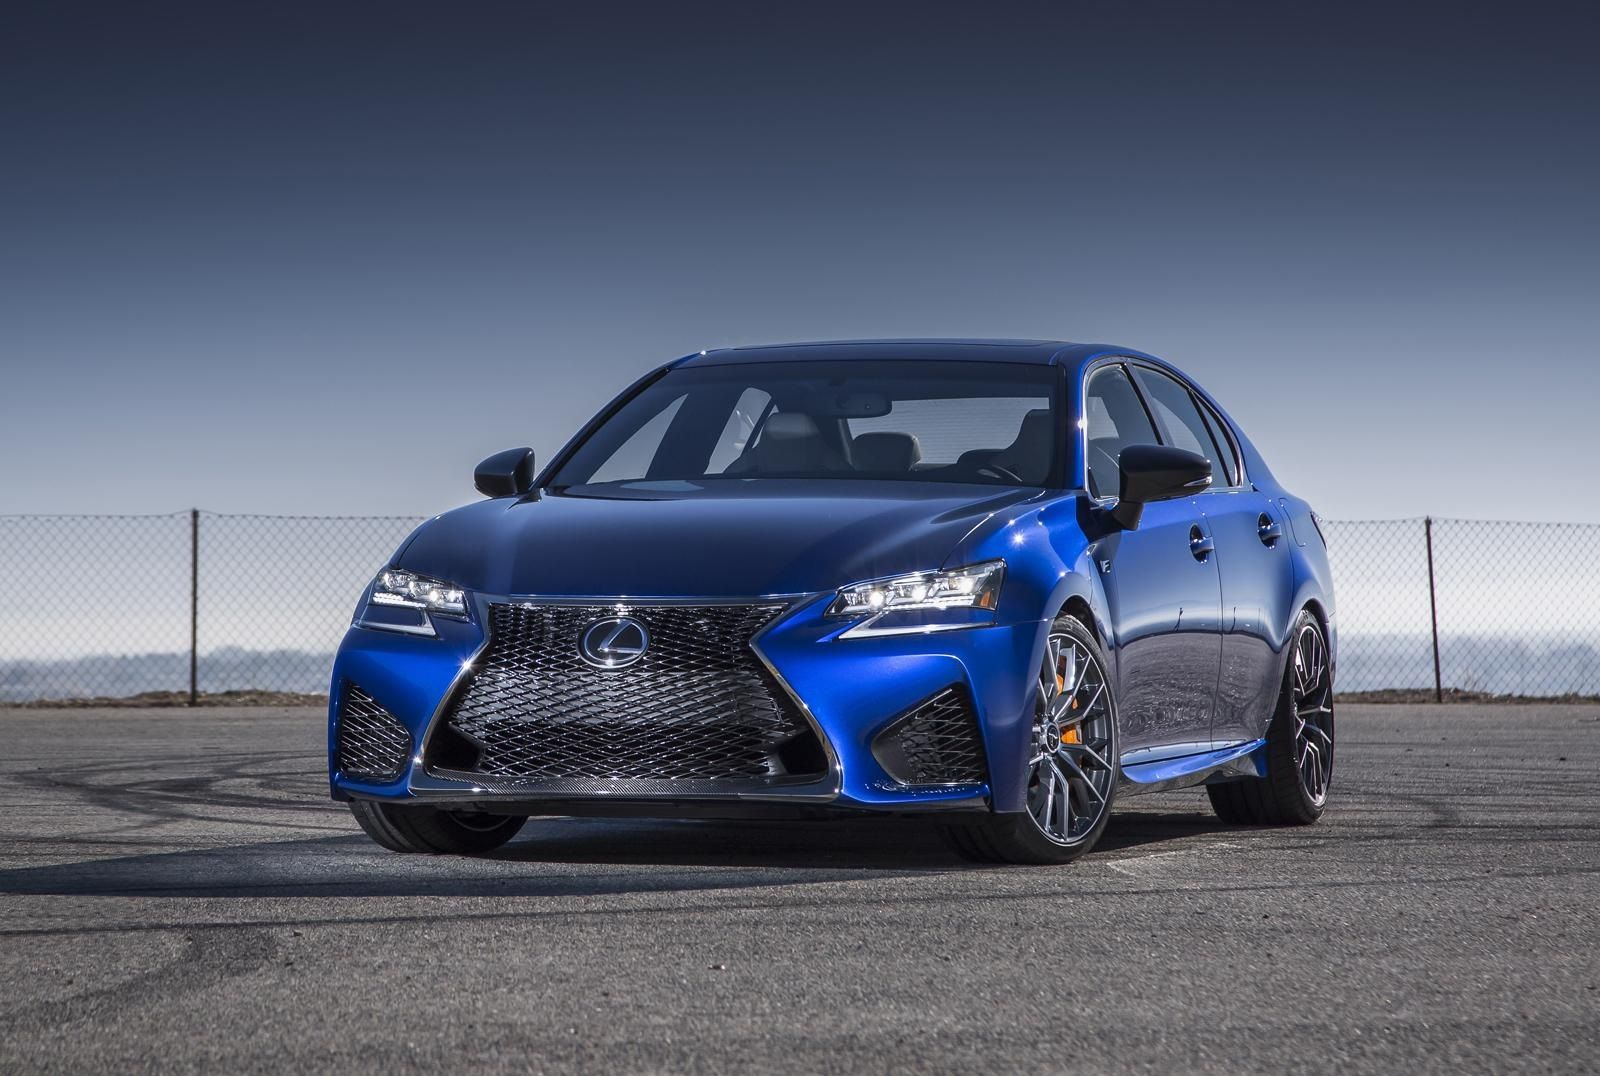 Awesome 2019 Lexus Hs Overview And Price Lexus Lexus Es New Lexus